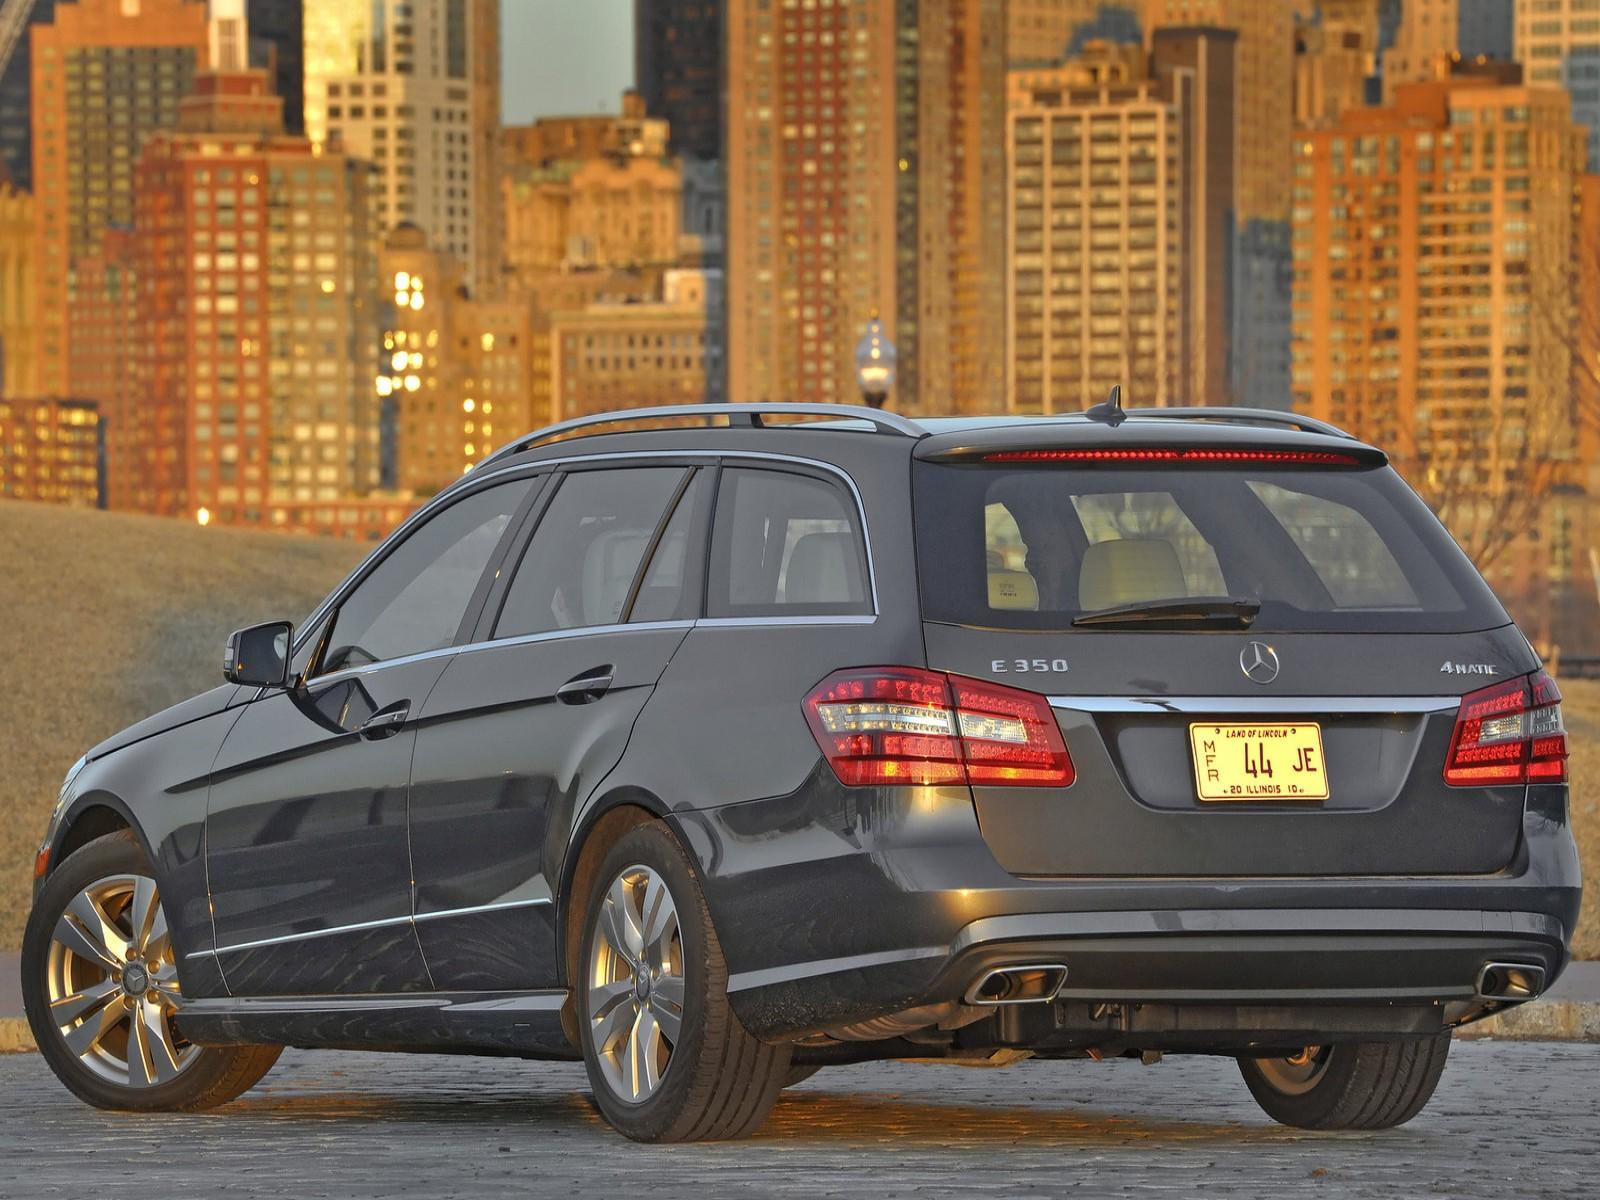 car pictures mercedes benz e350 4matic wagon 2011. Black Bedroom Furniture Sets. Home Design Ideas